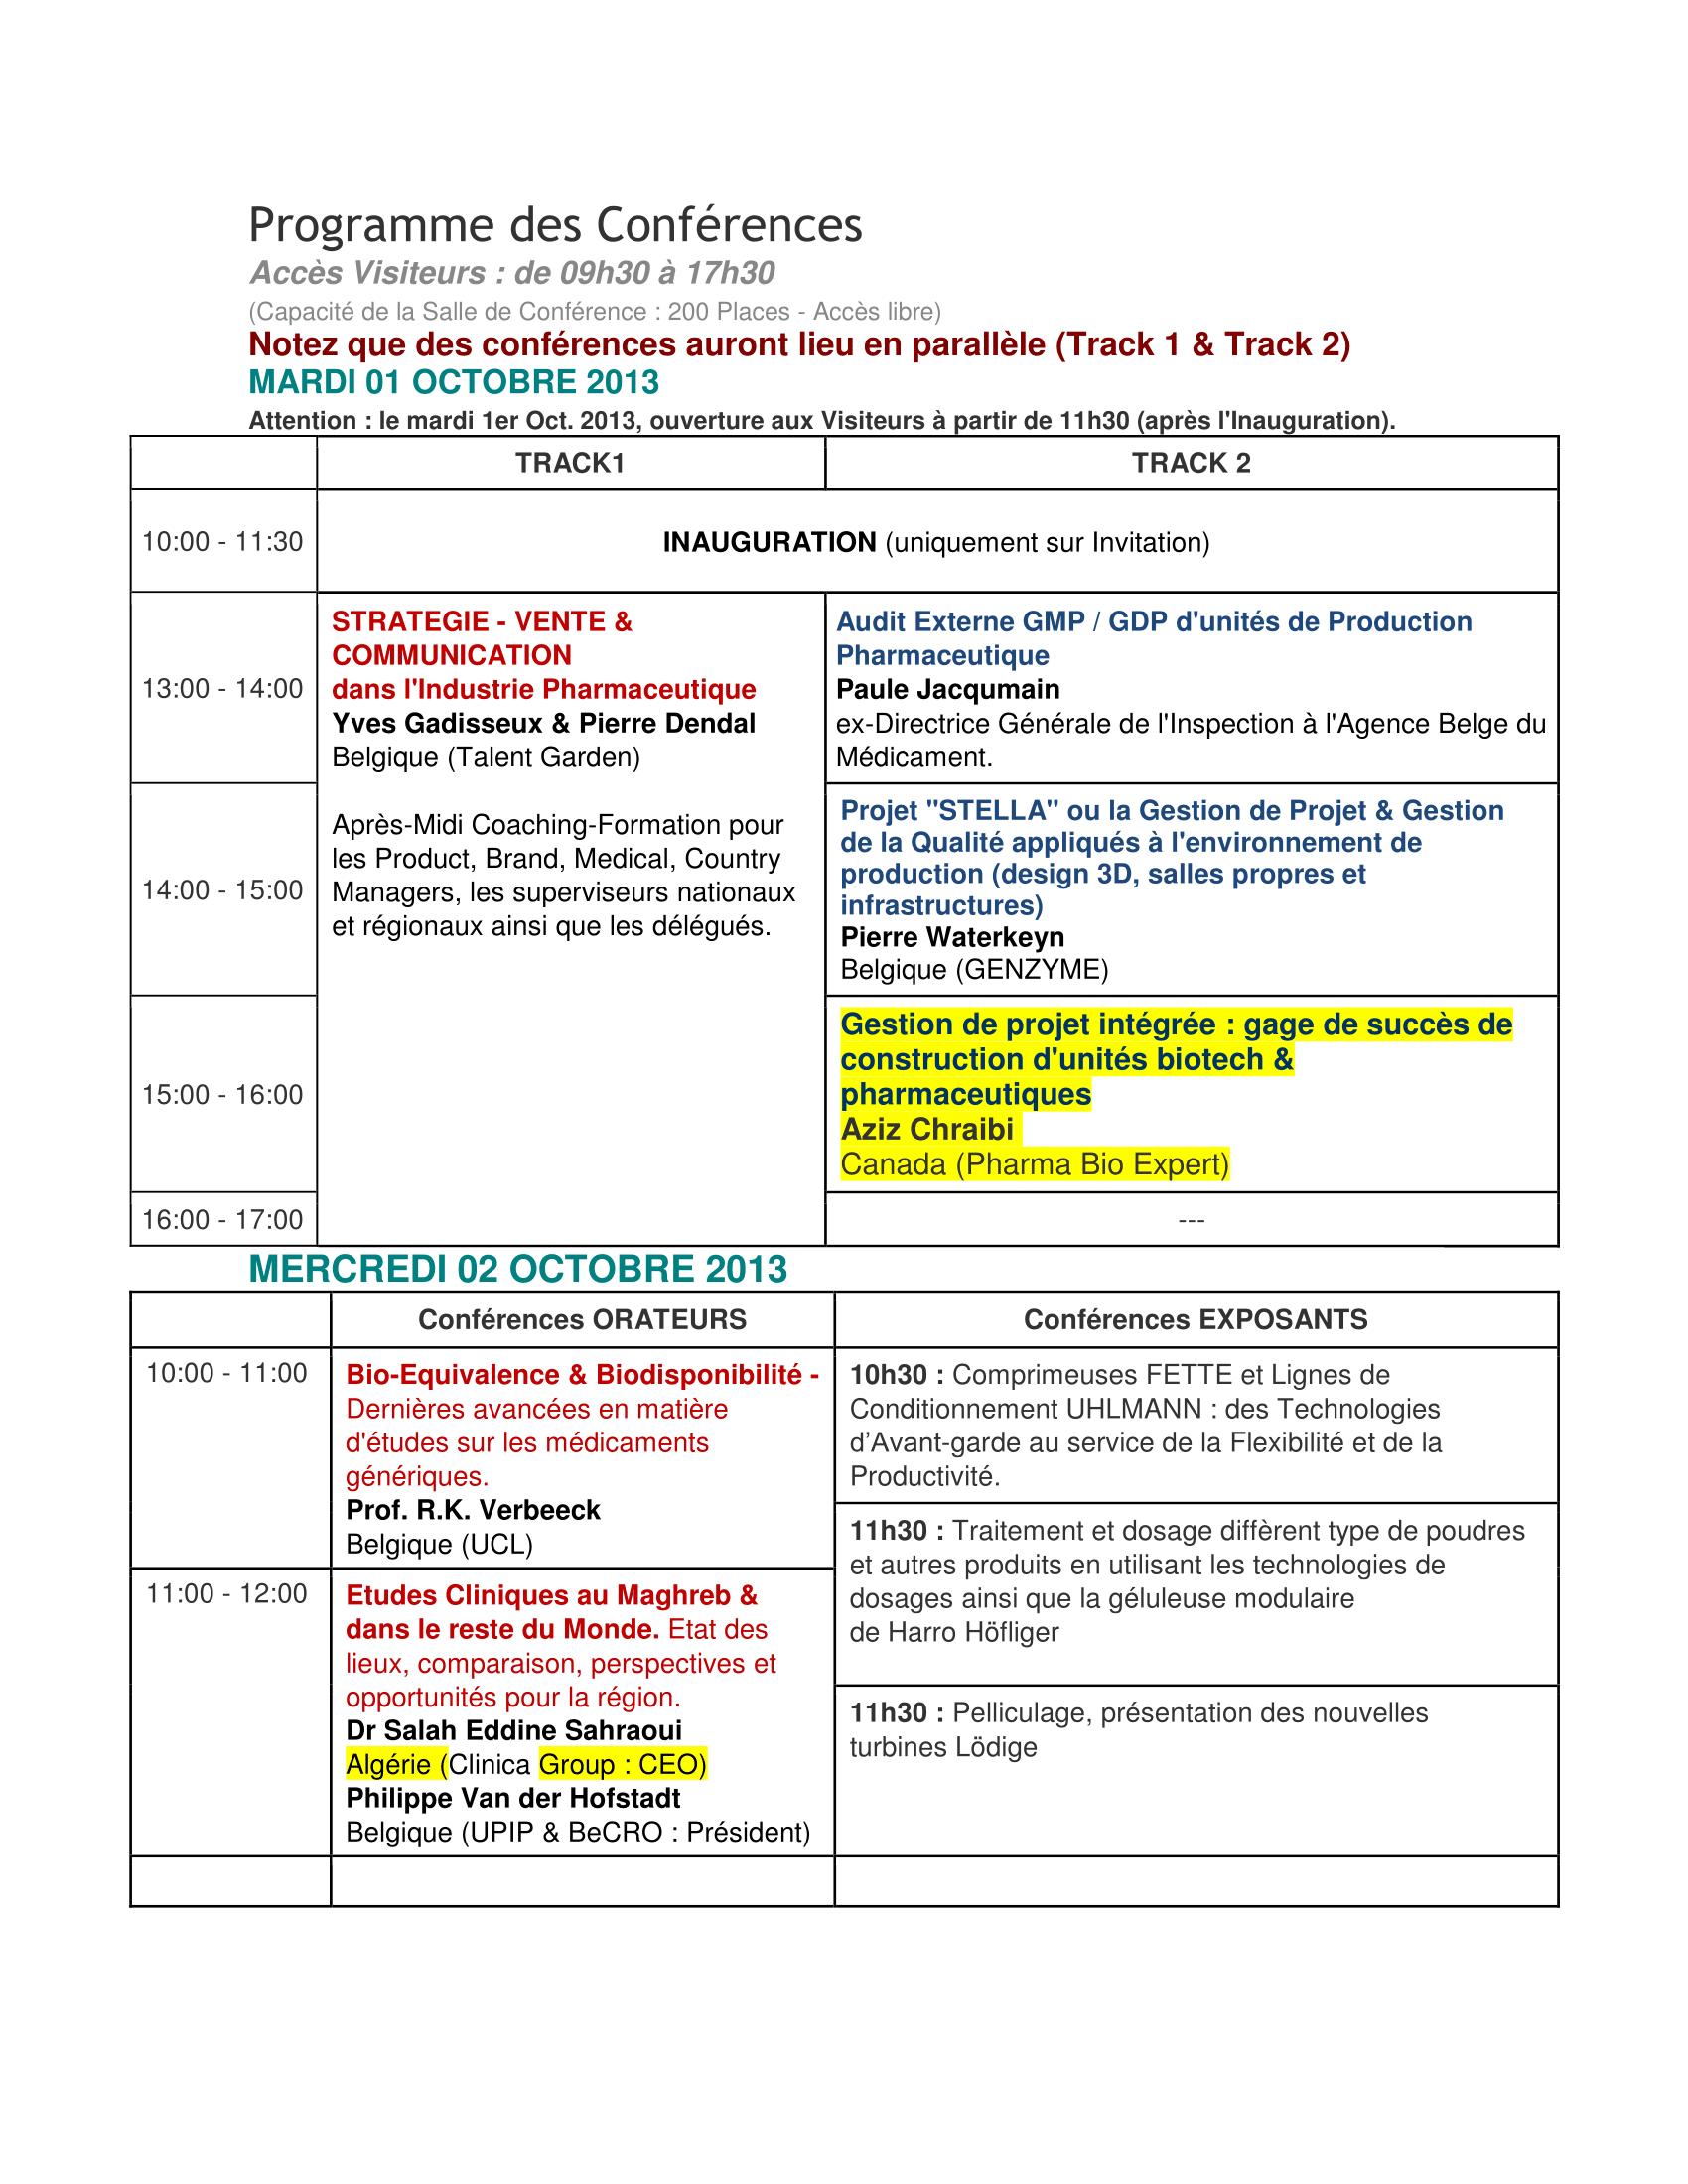 https://pbe-expert.com/wp-content/uploads/2018/04/Programme-des-Conférences_MAGHREB-PHARMA-2013-ORAN-1.png